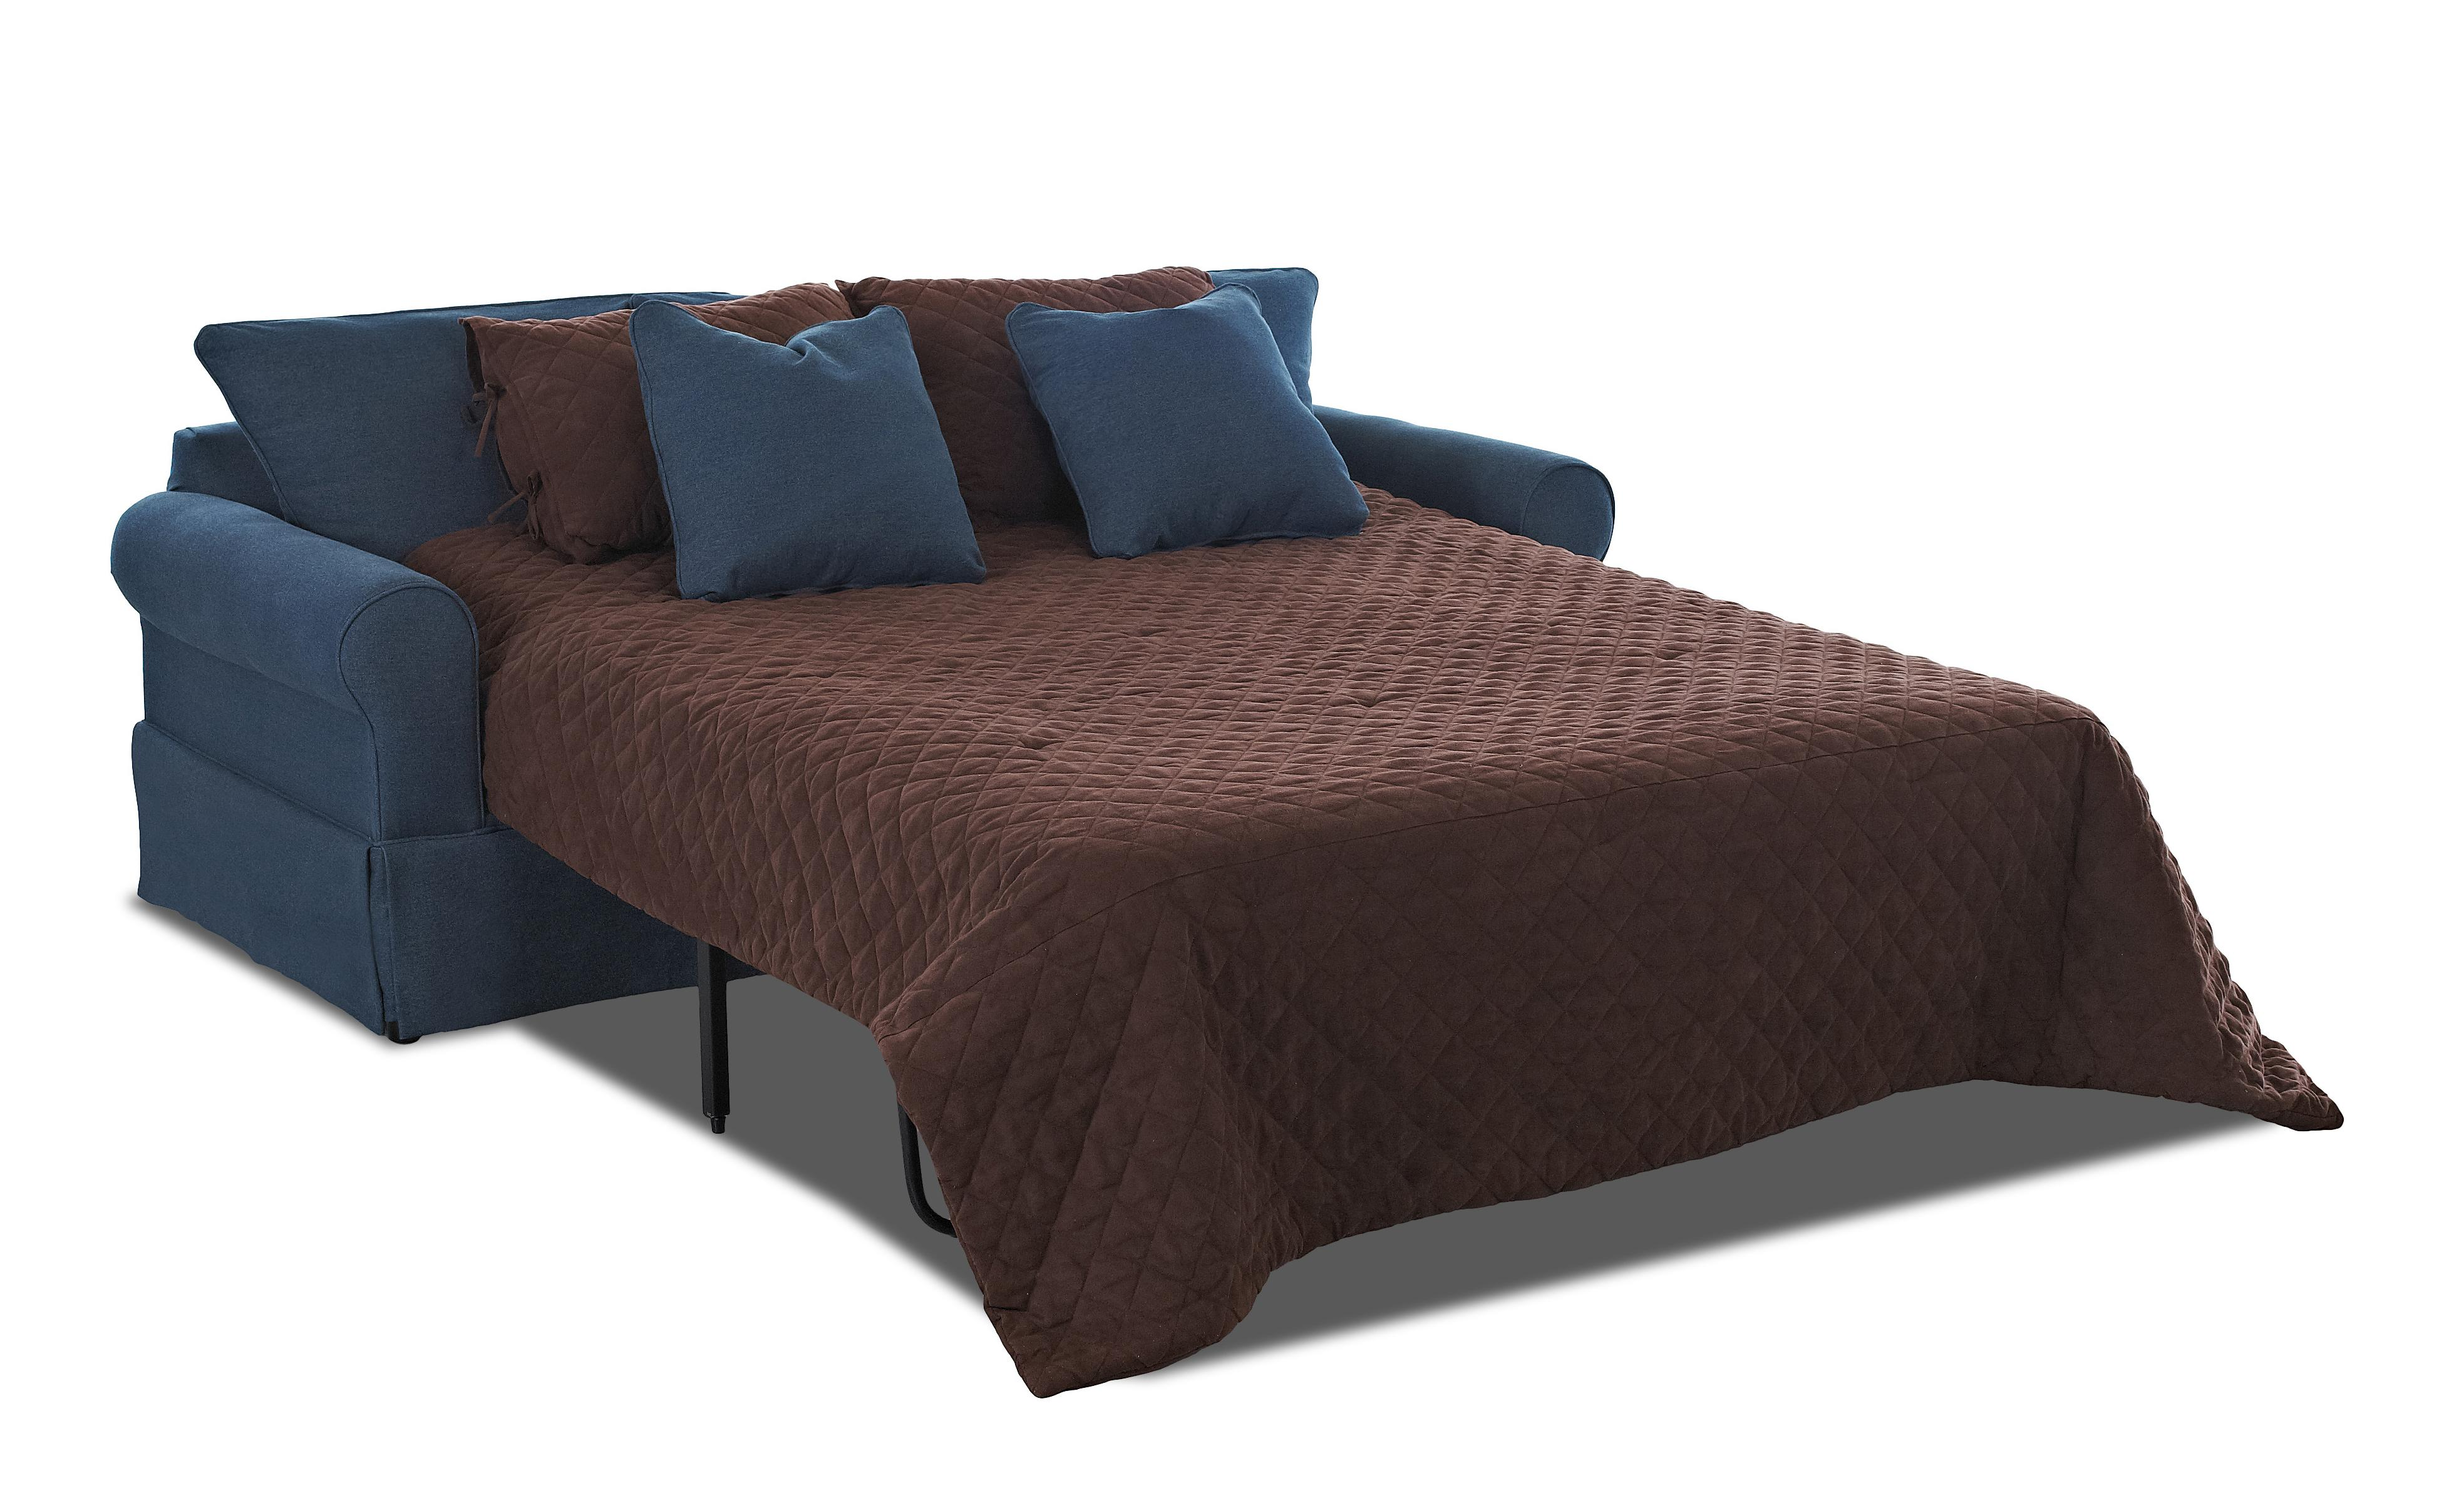 Klaussner Brook Skirted Dreamquest Queen Sleeper Sofa